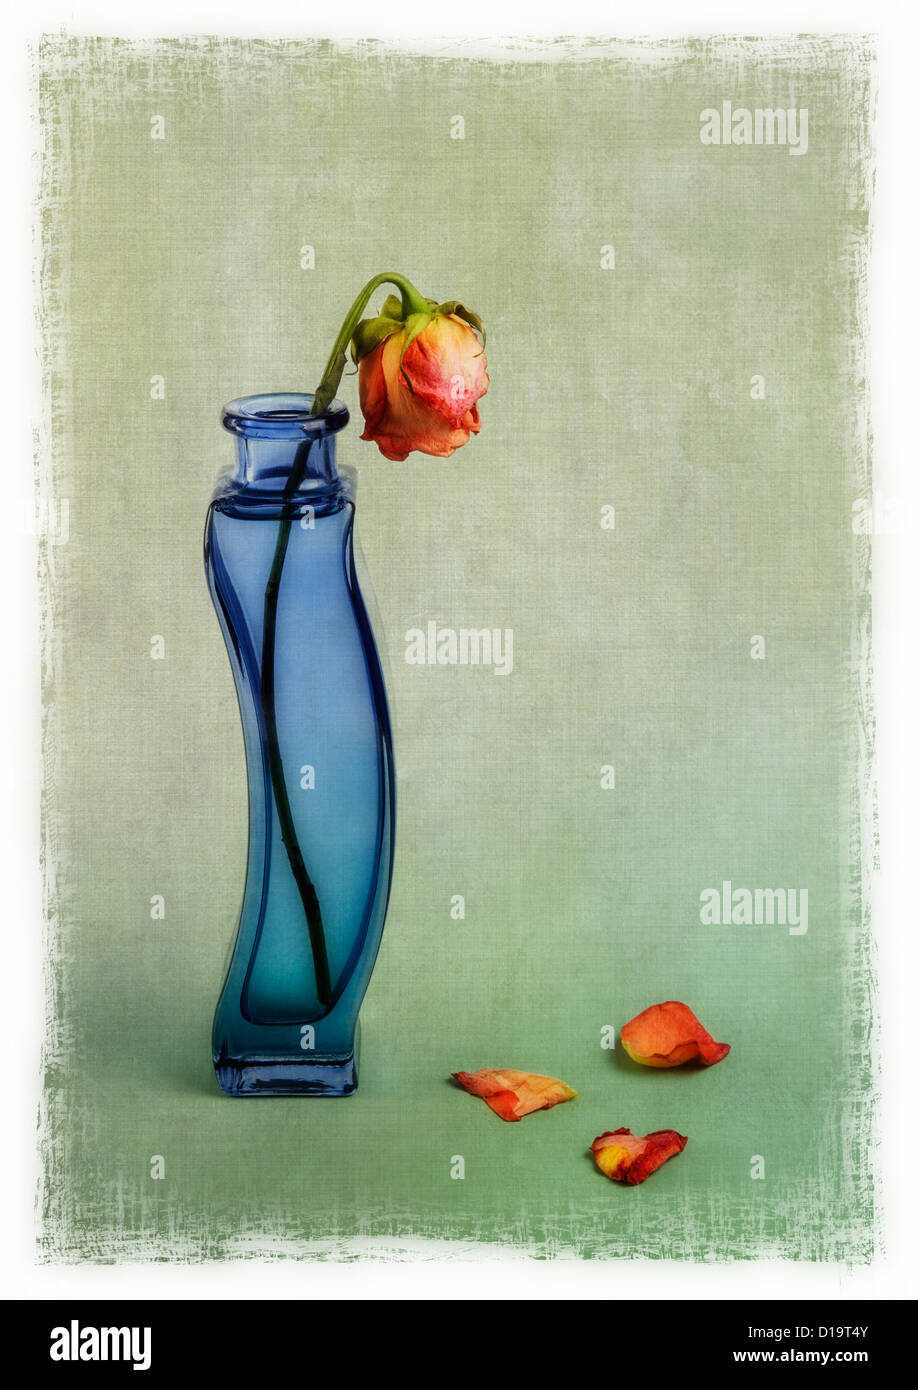 rote Rosen in blauer Vase mit Textur-overlay Stockbild